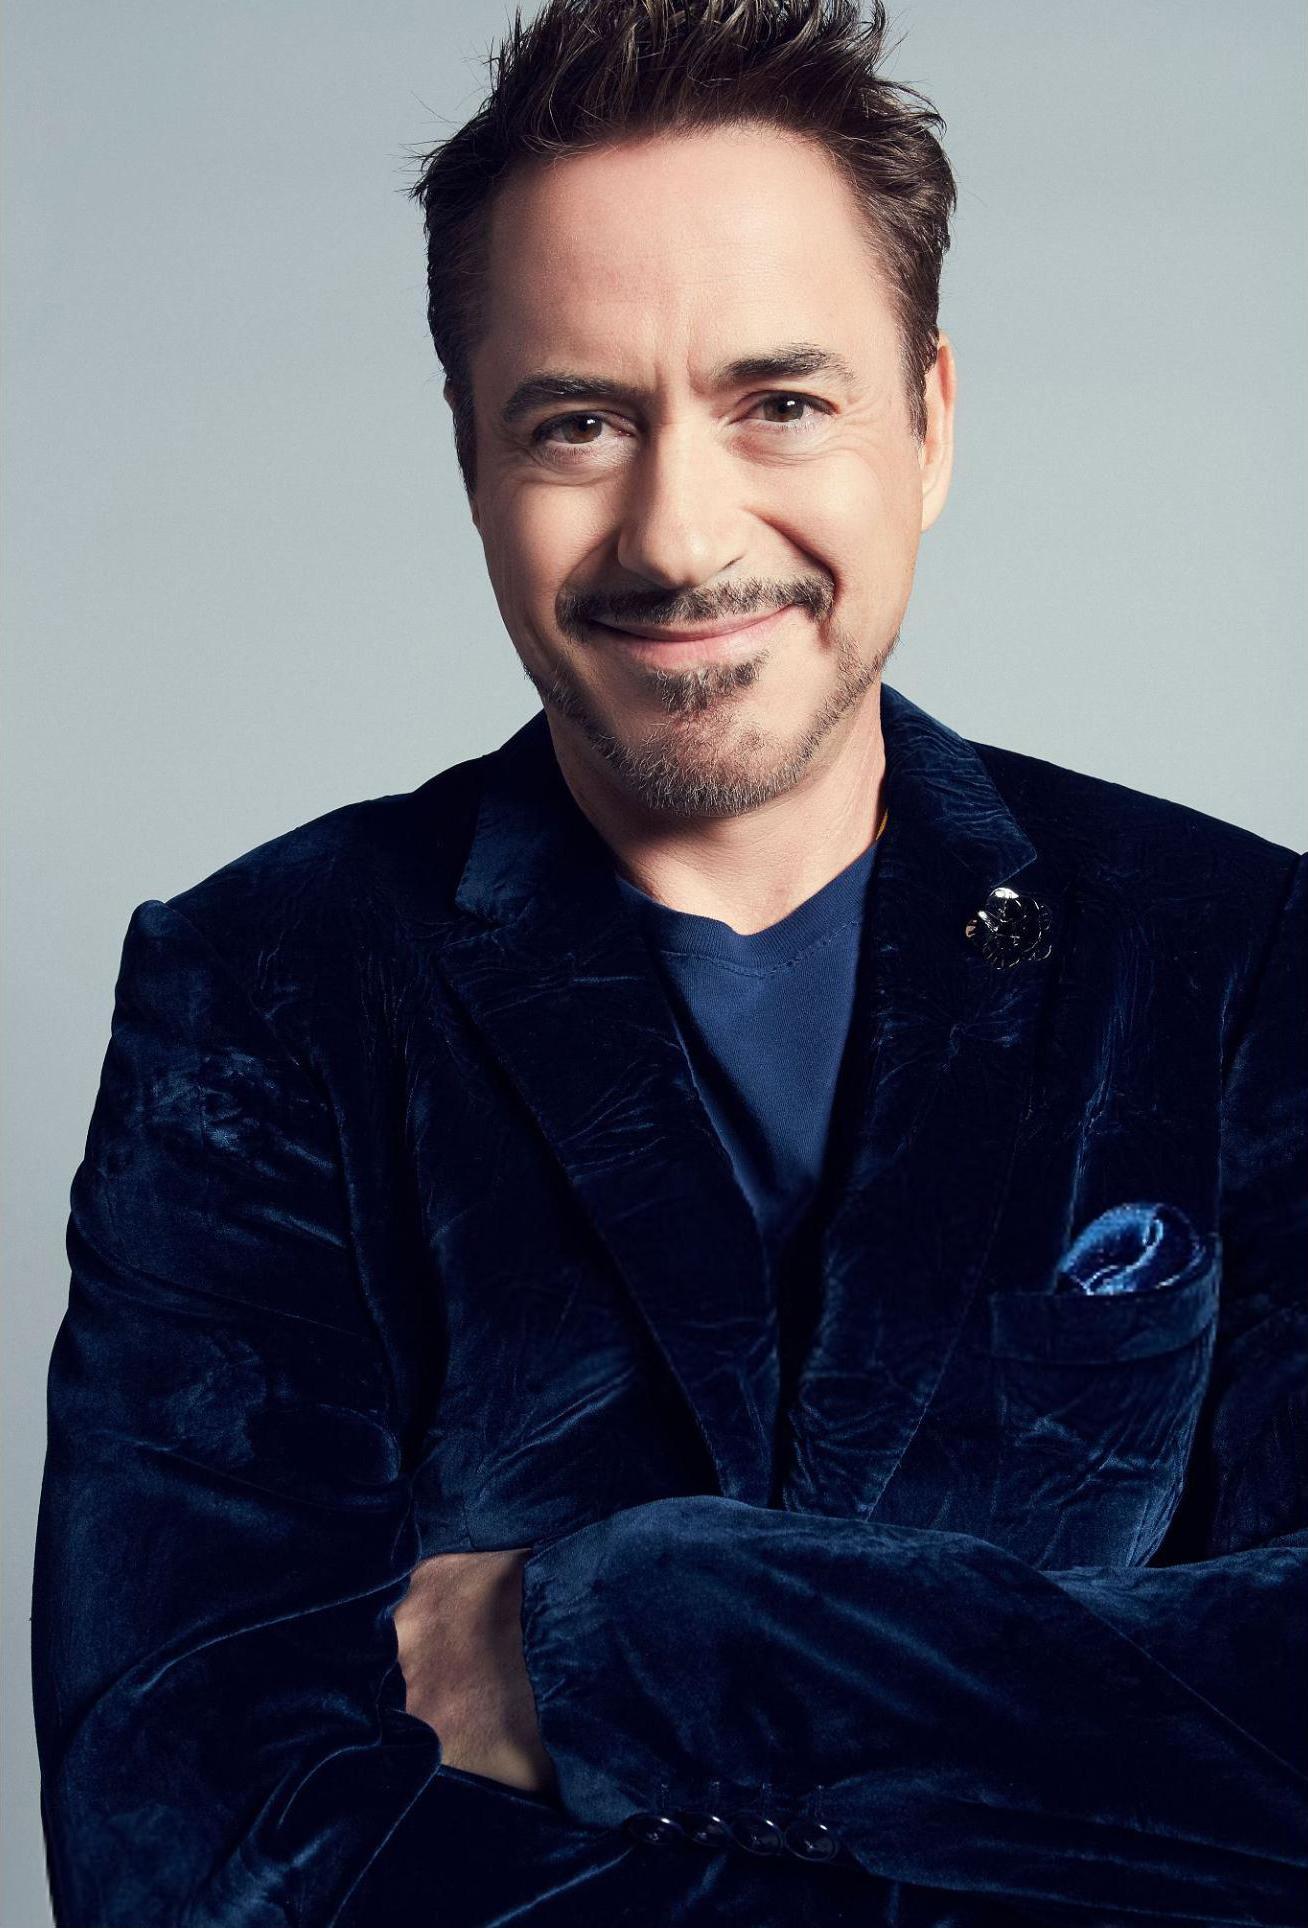 Robert Downey Jr. photo 869 of 884 pics, wallpaper - photo ... Robert Downey